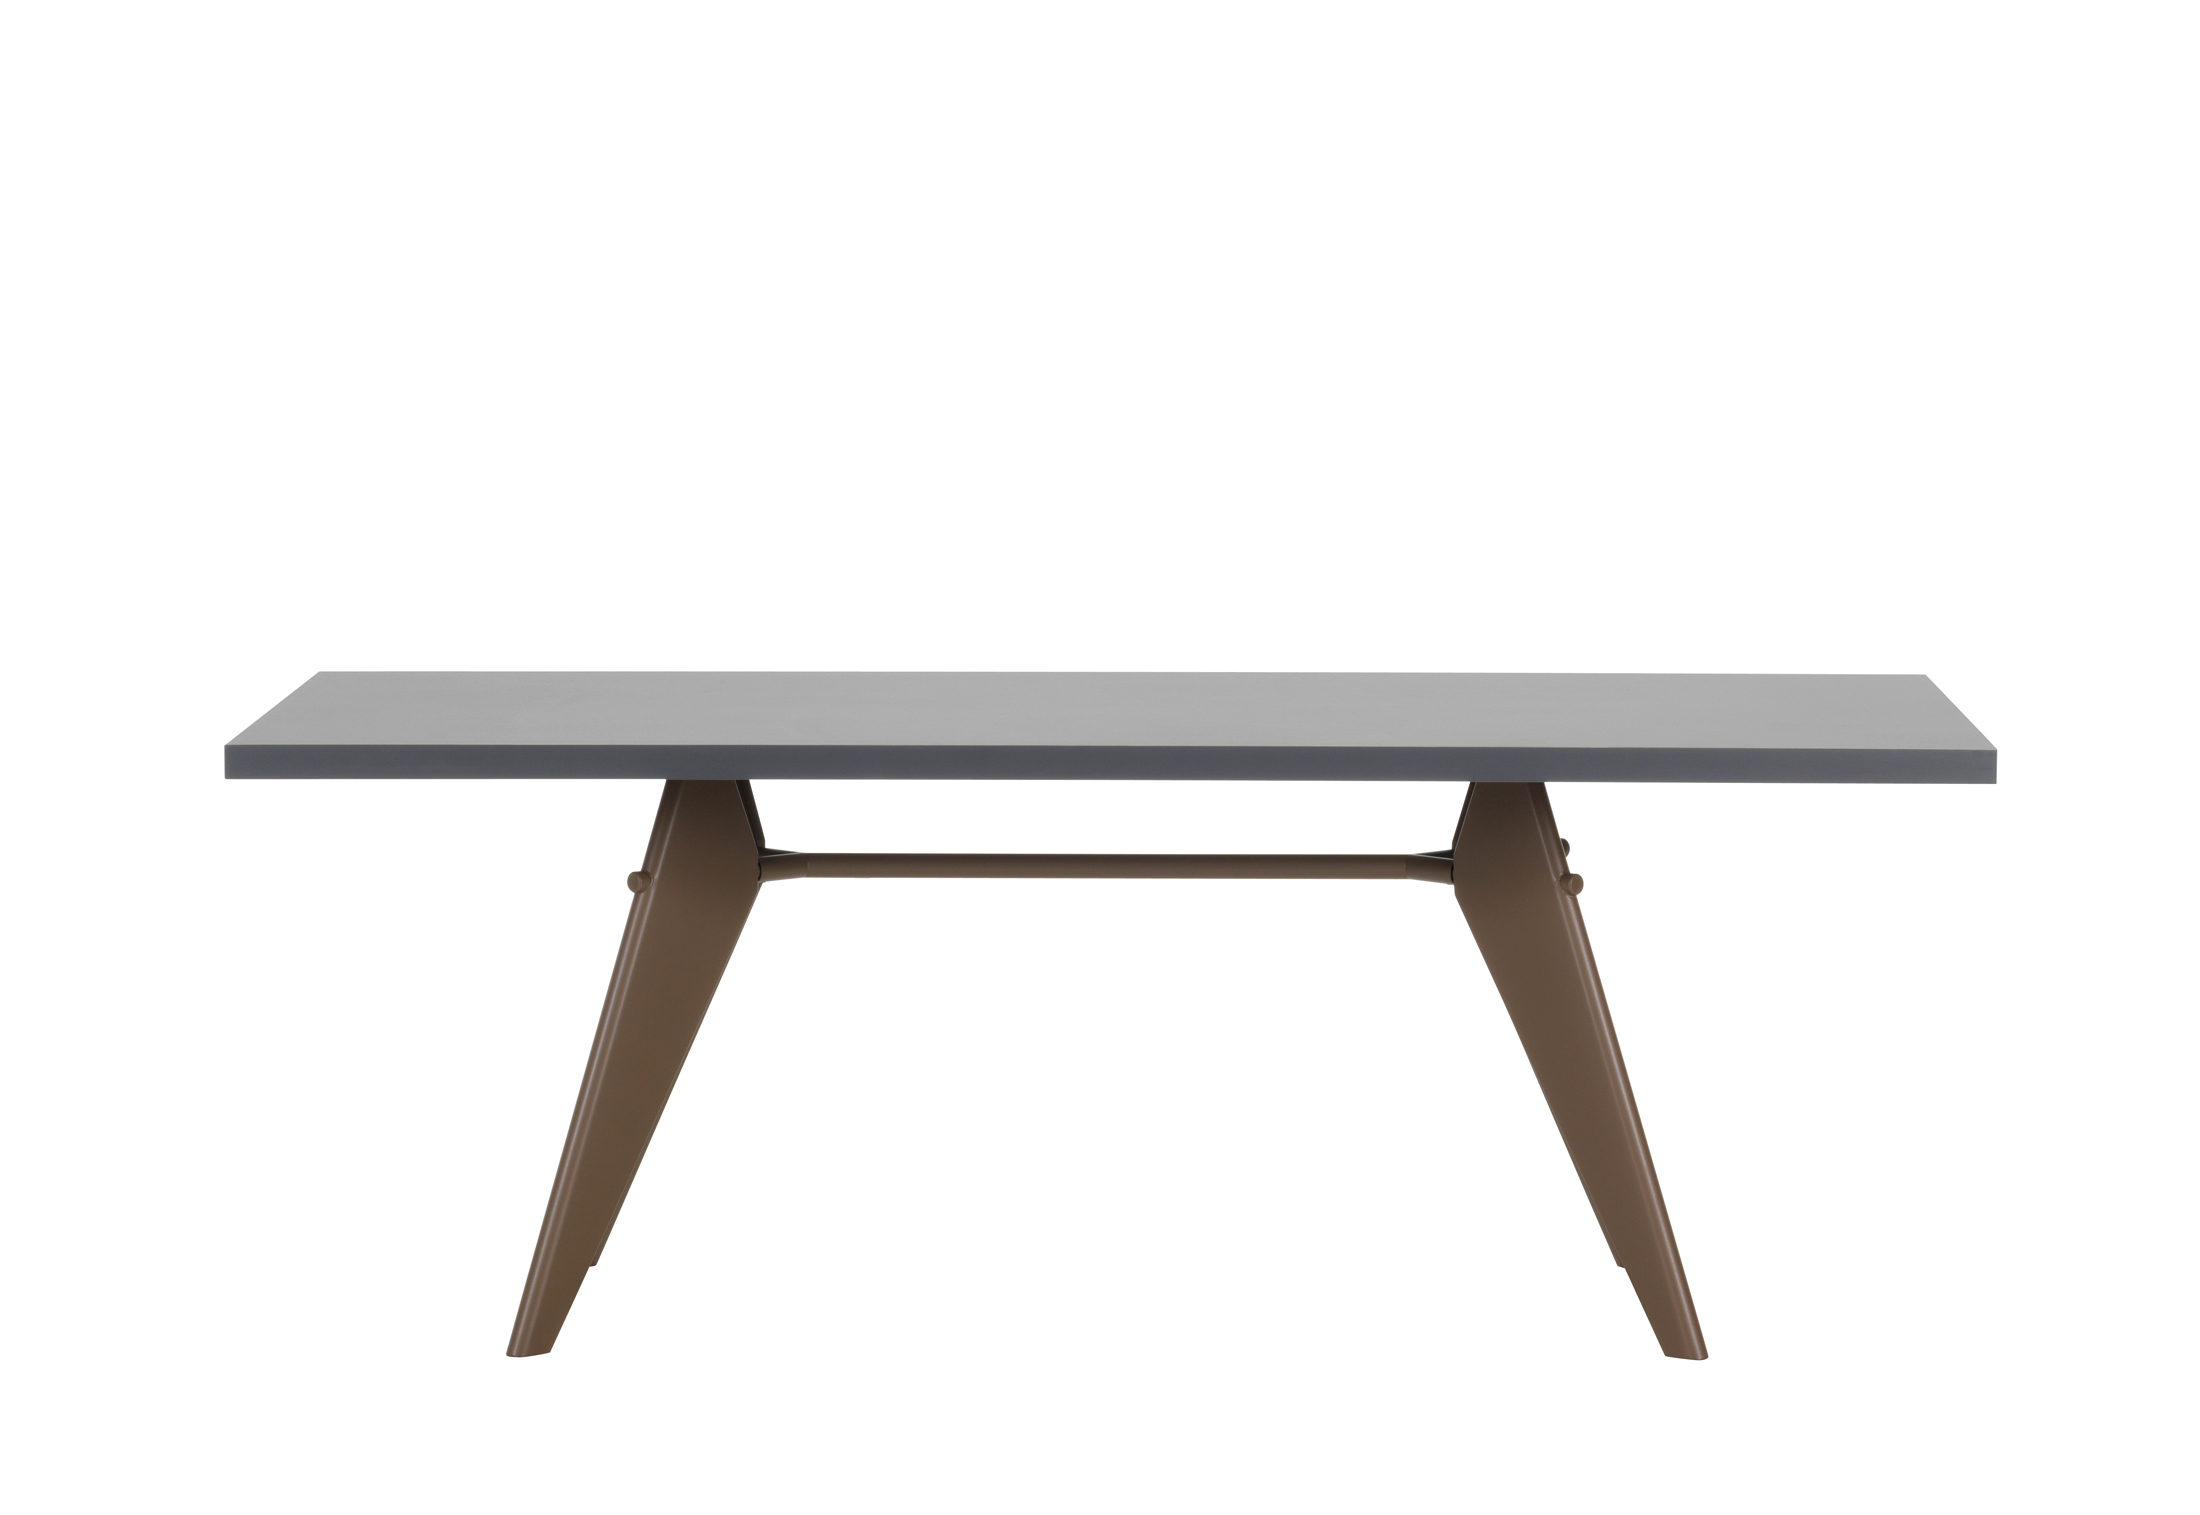 Timeless Design Em Table By Jean Prouve For Vitra Sohomod Blog